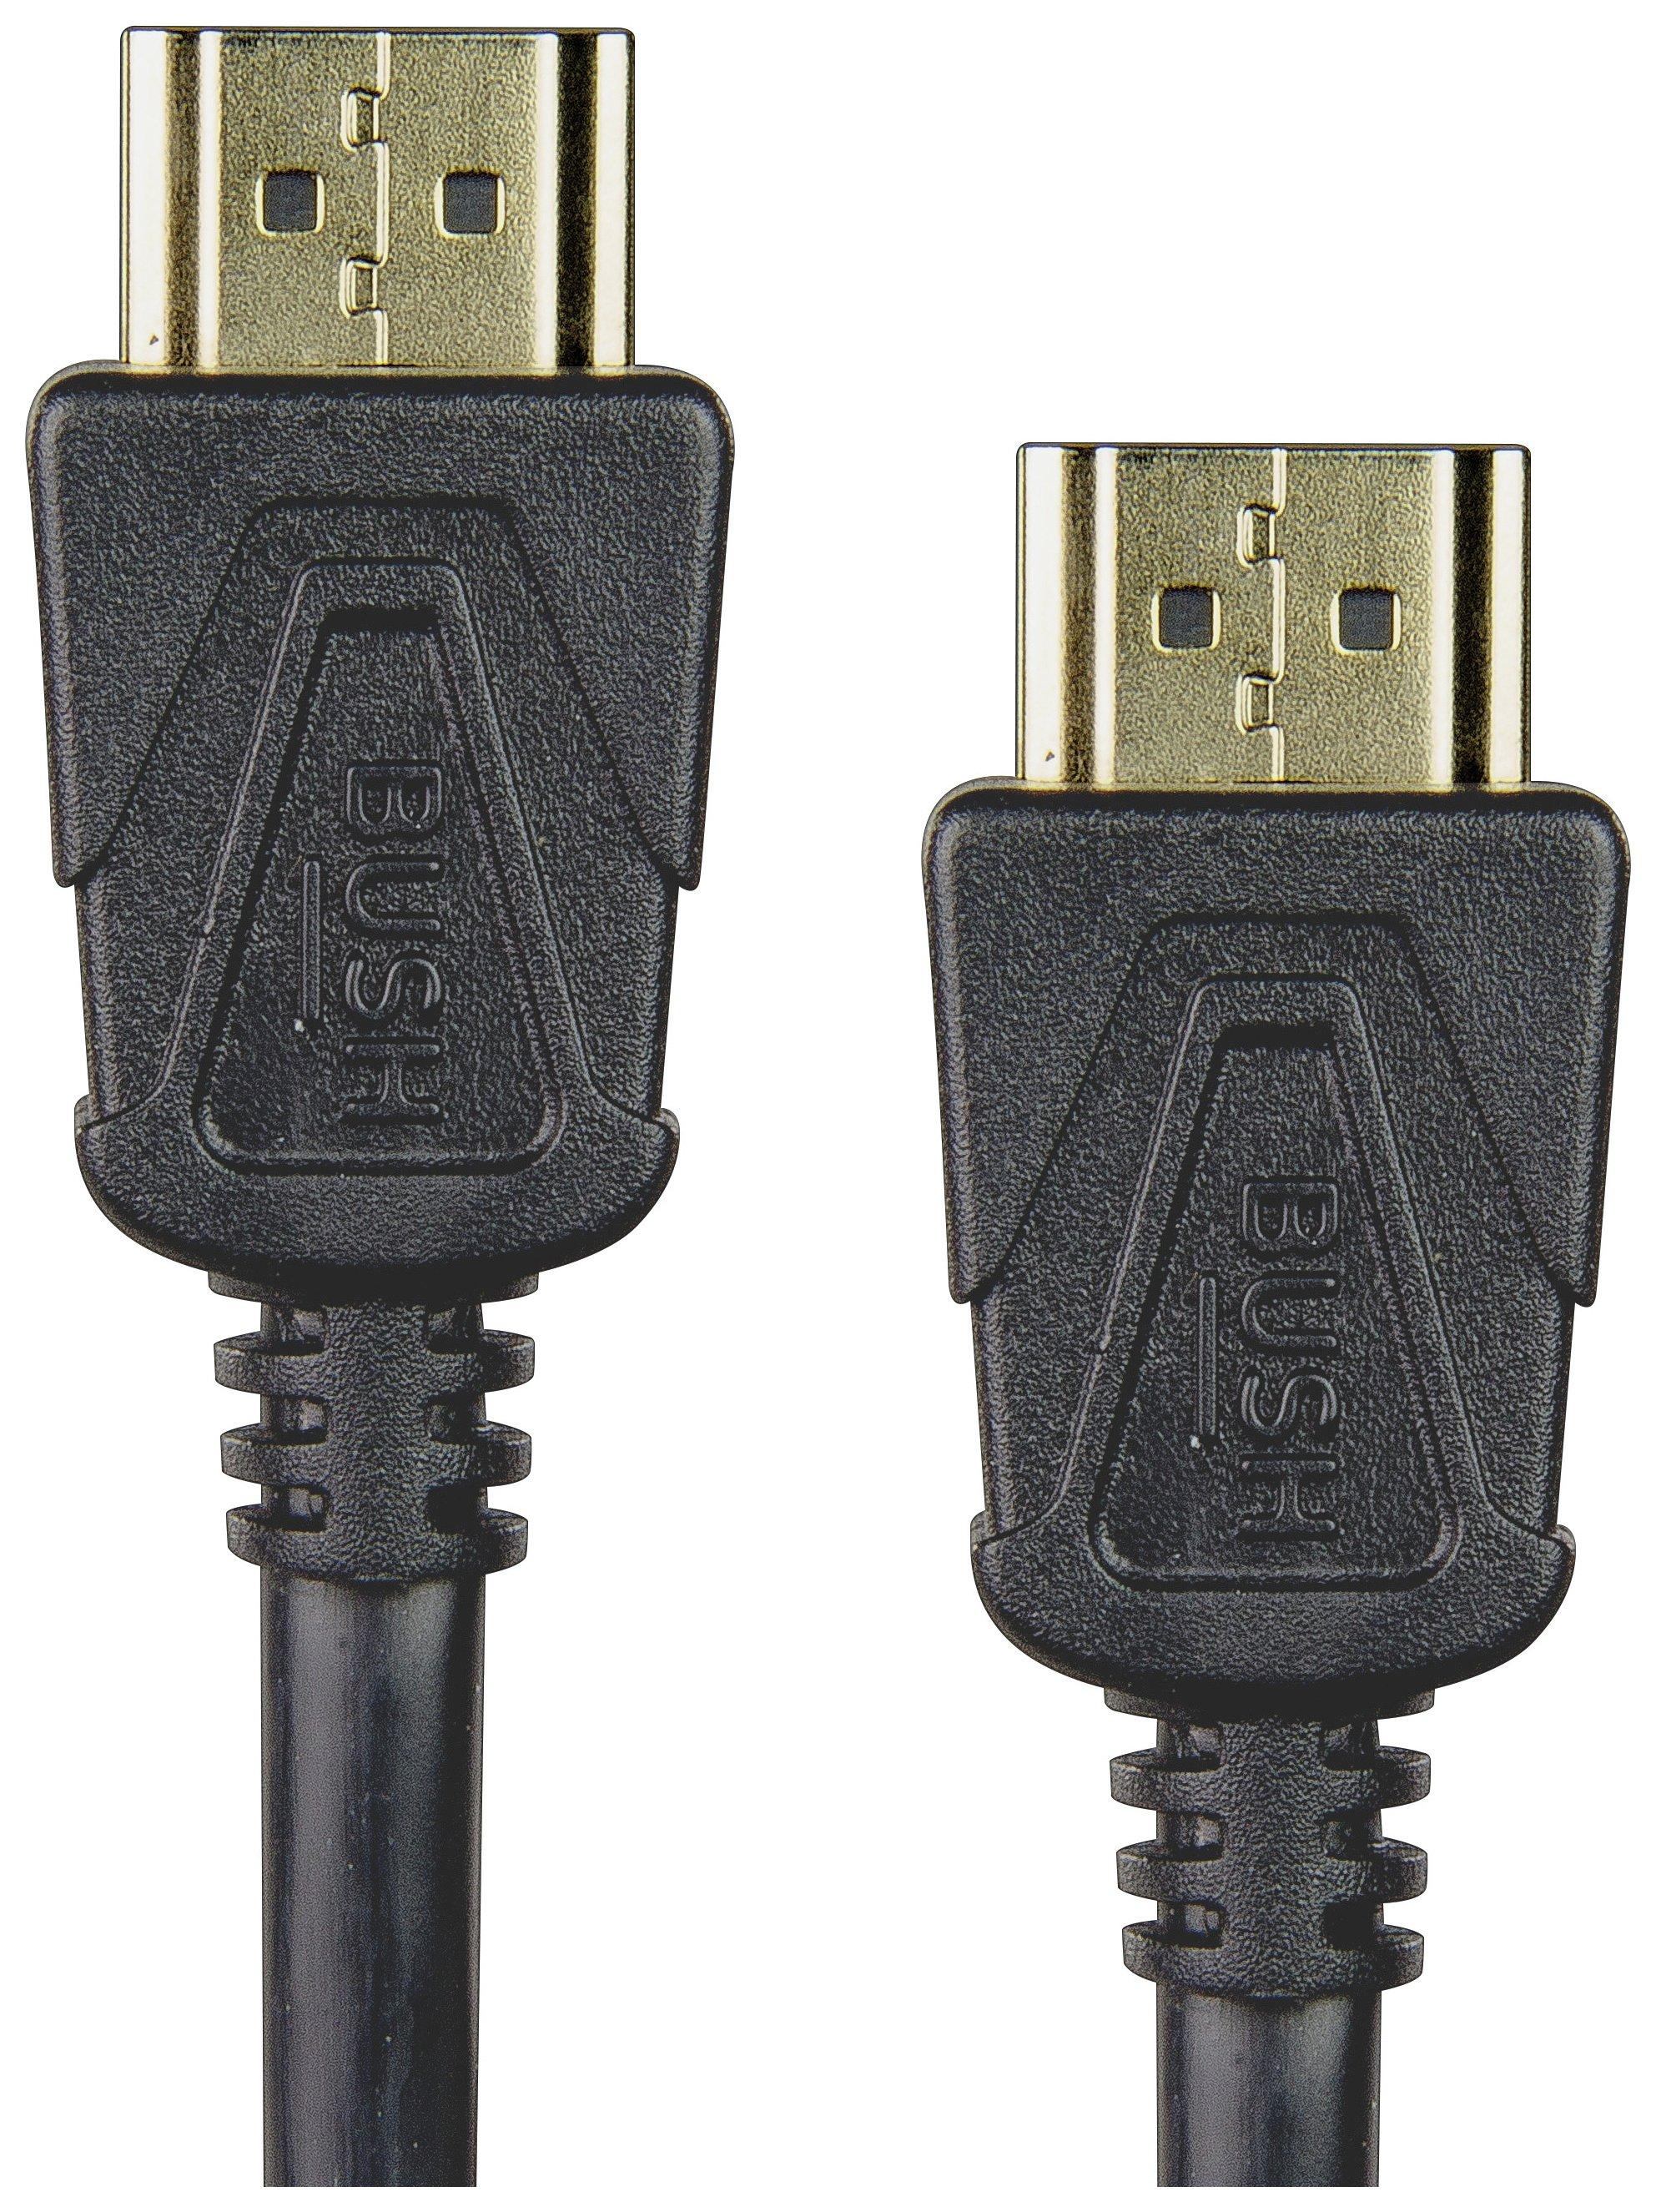 Image of Bush 1m HDMI Cable